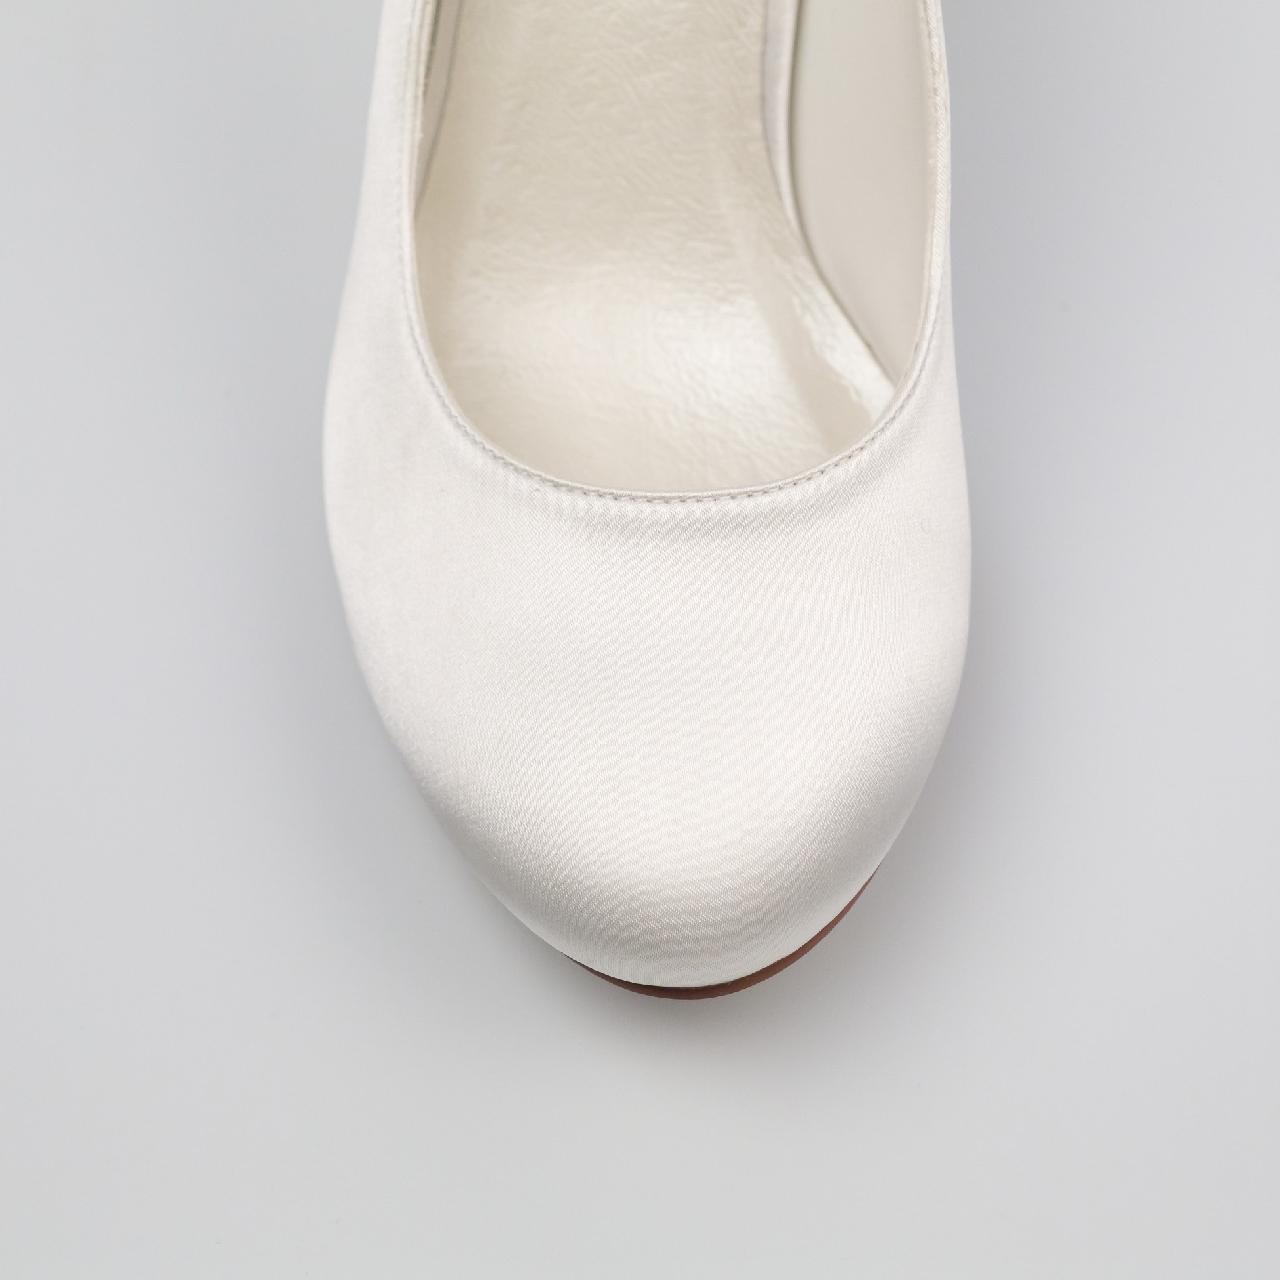 Svadobné topánky Diana - Obrázok č. 3